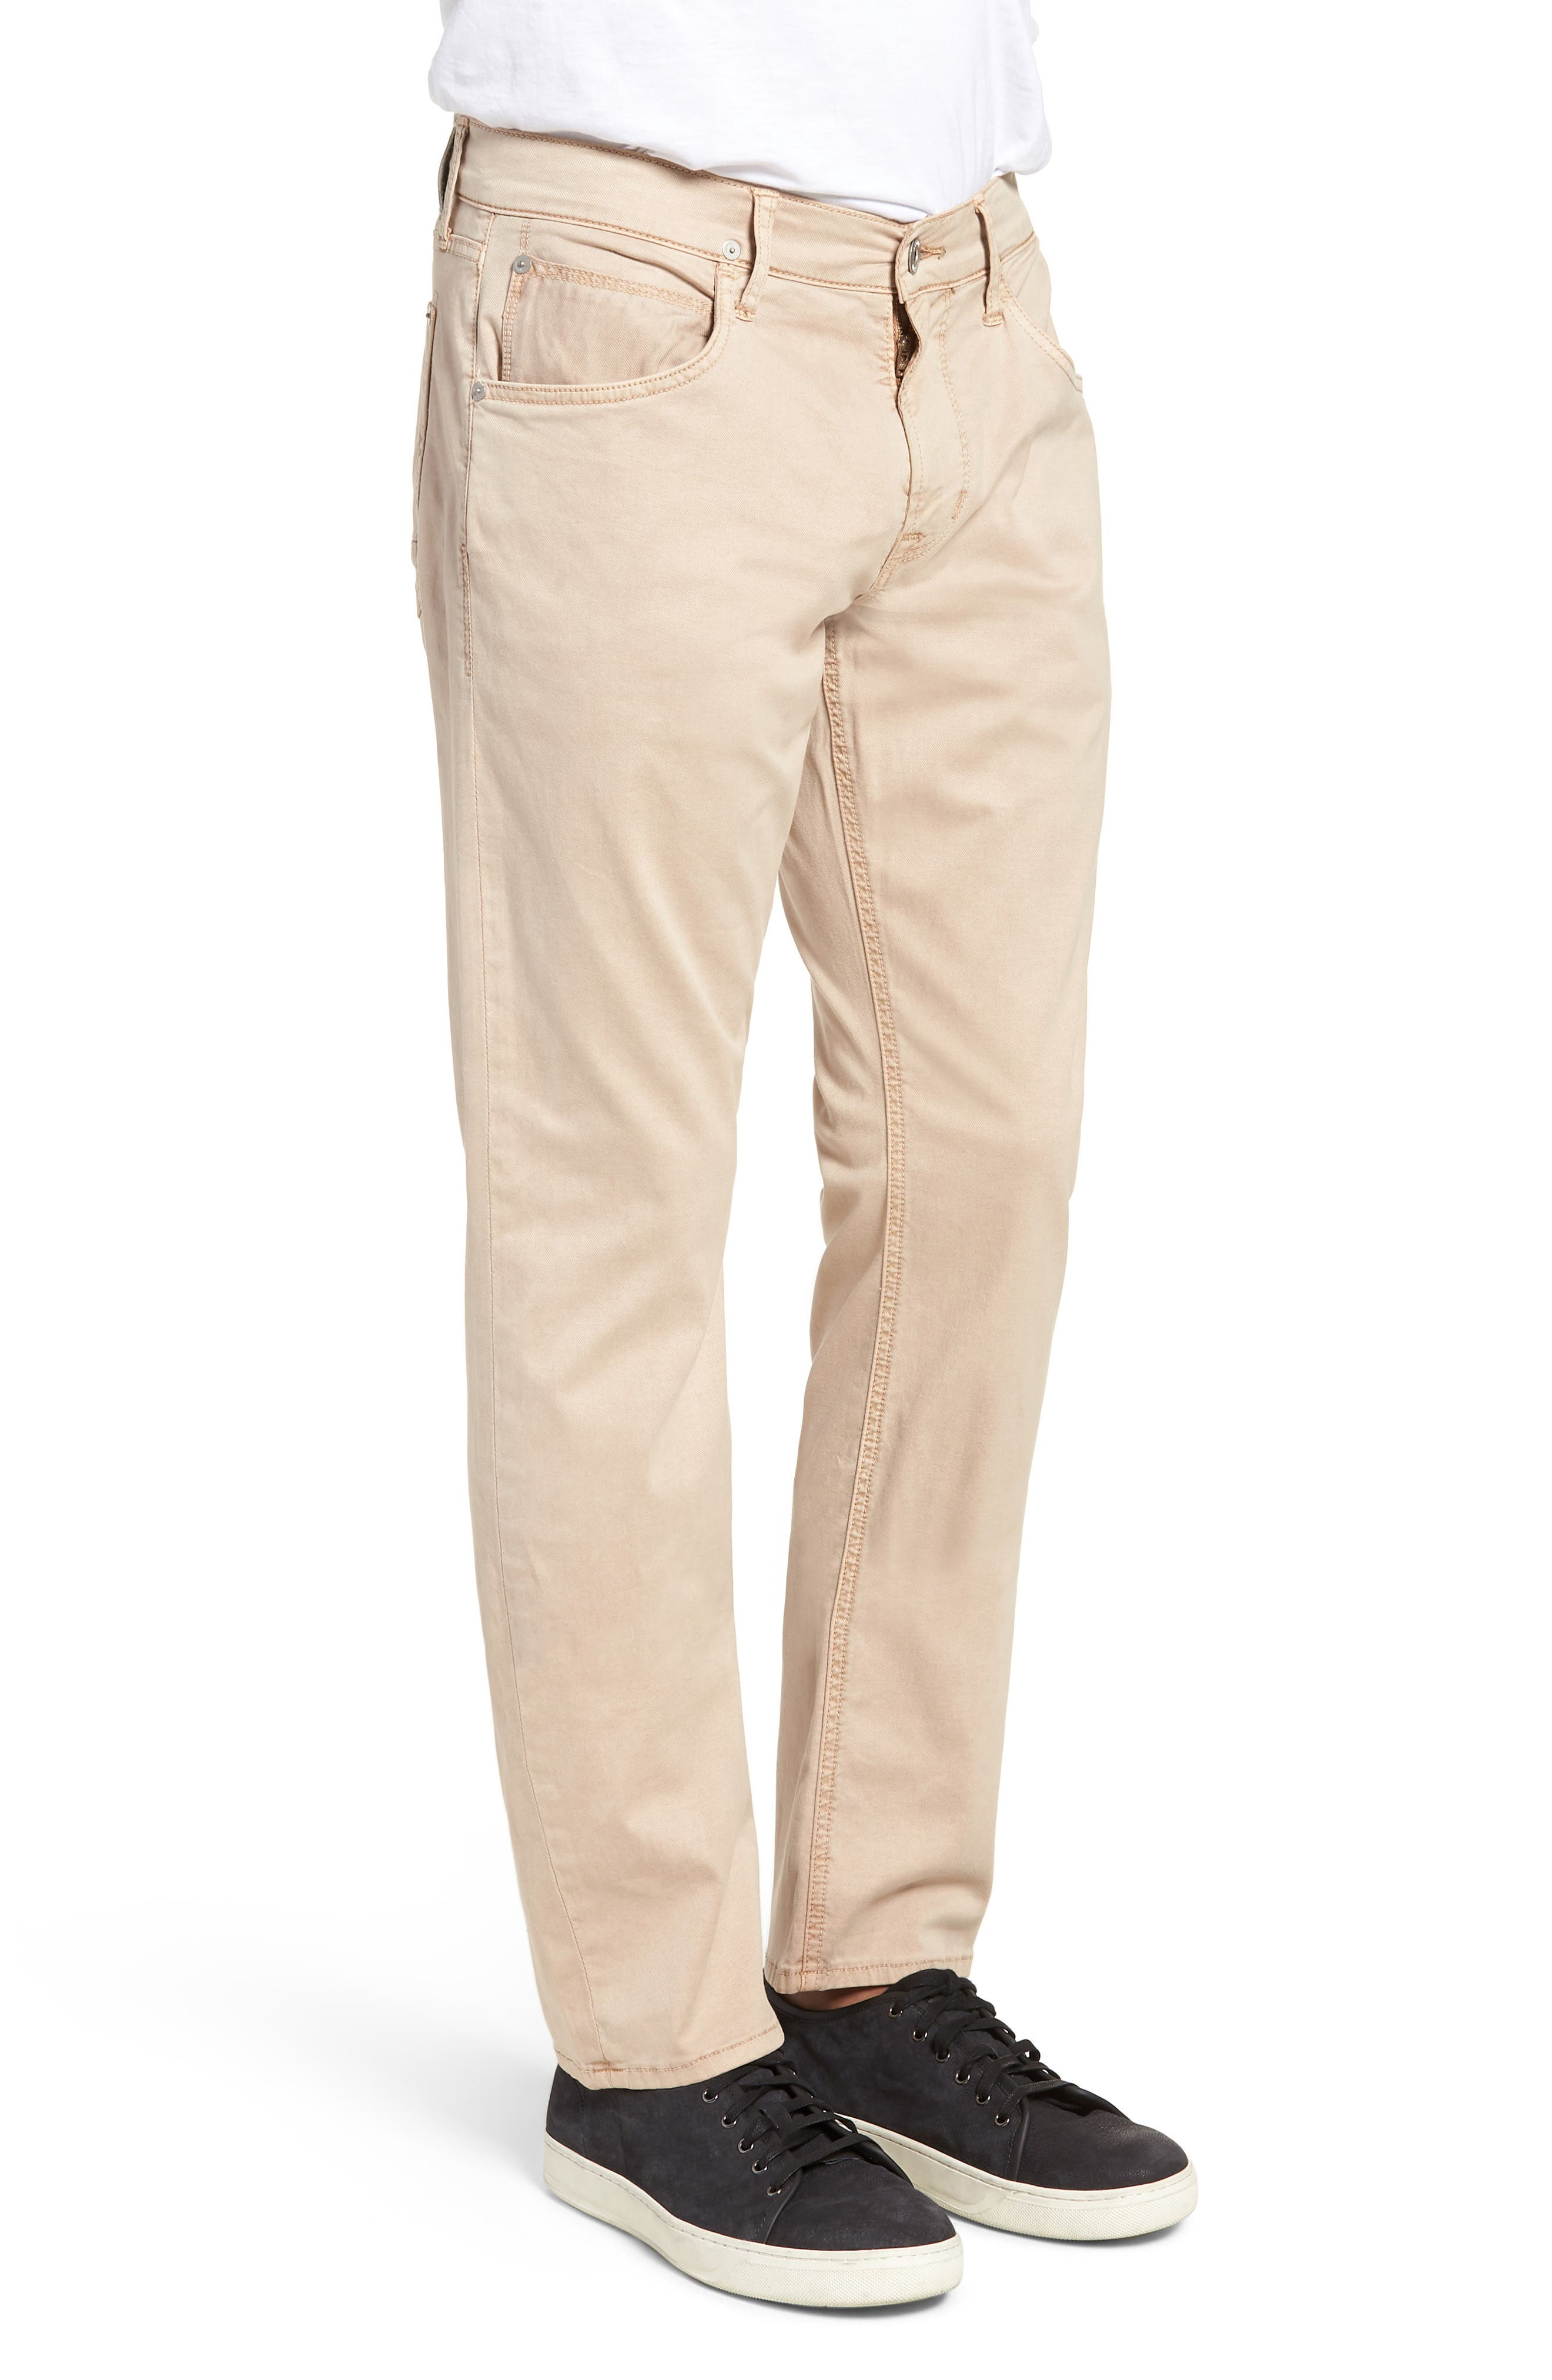 Blake Slim Fit Jeans,                             Alternate thumbnail 3, color,                             250